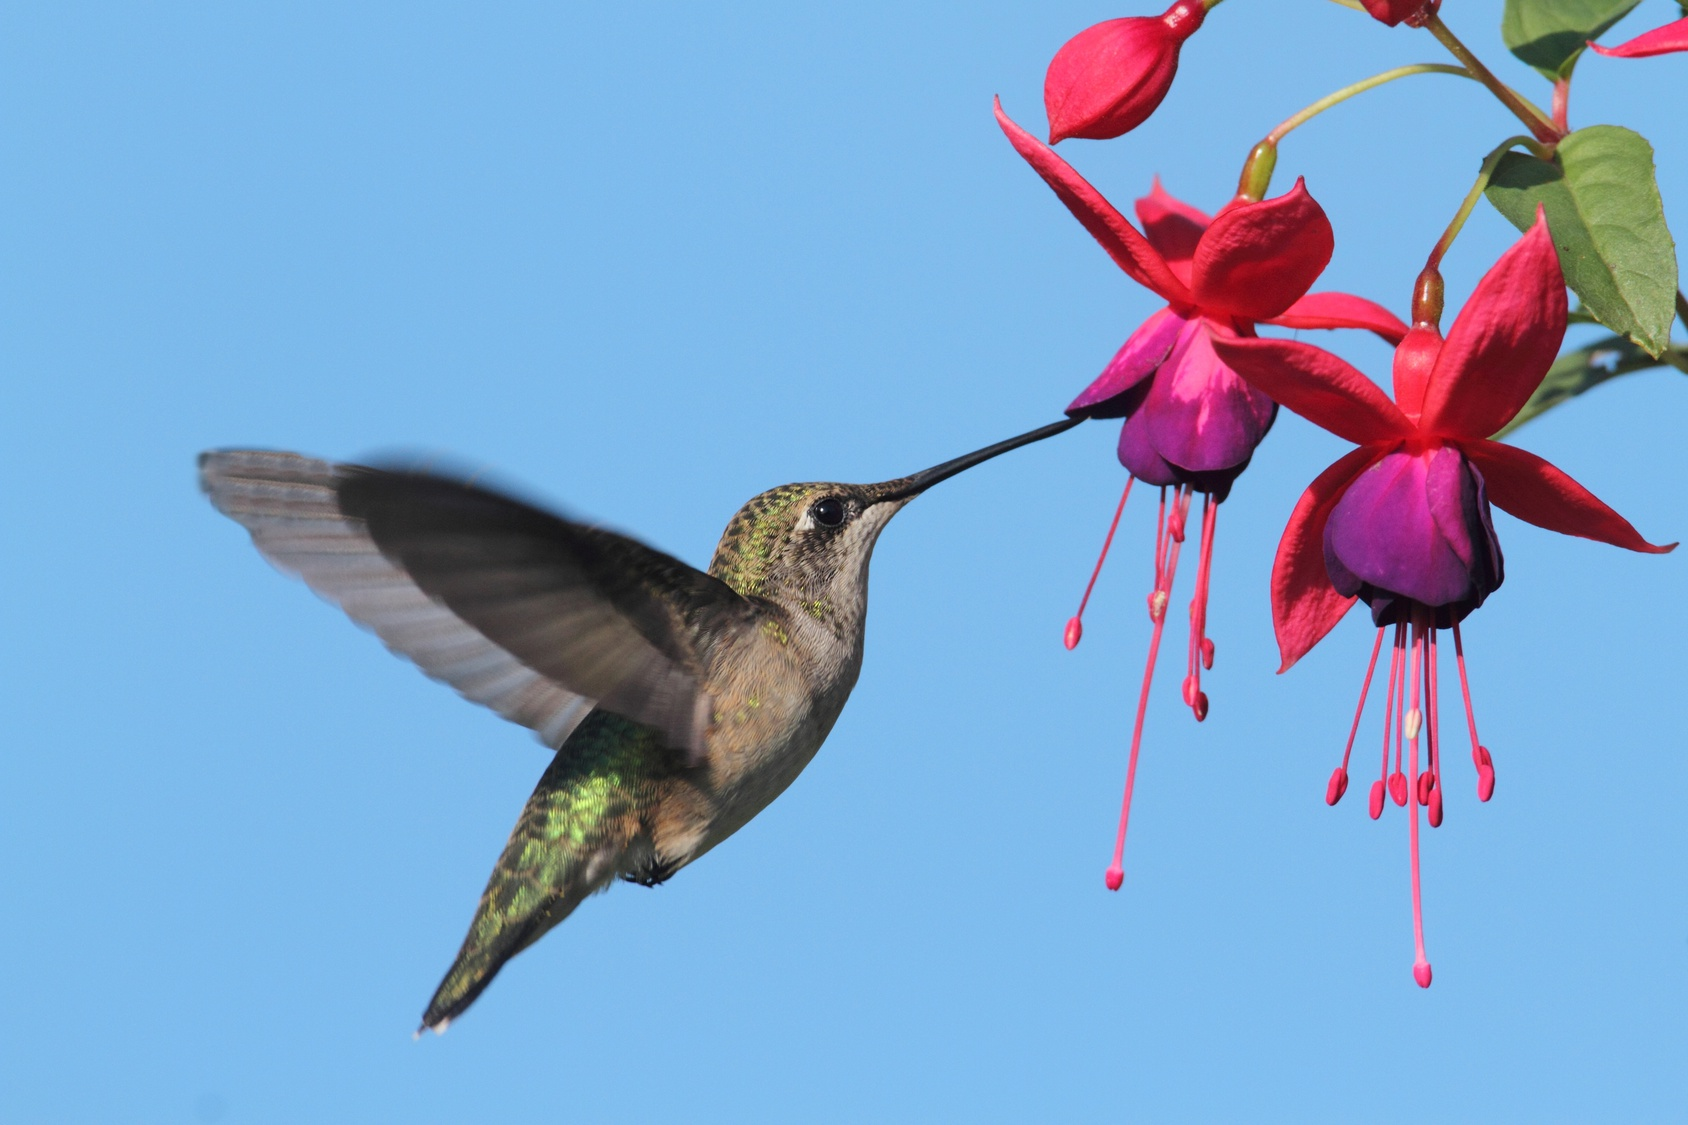 humminbird drinking from fuschia flowers as the season for allergies progresses